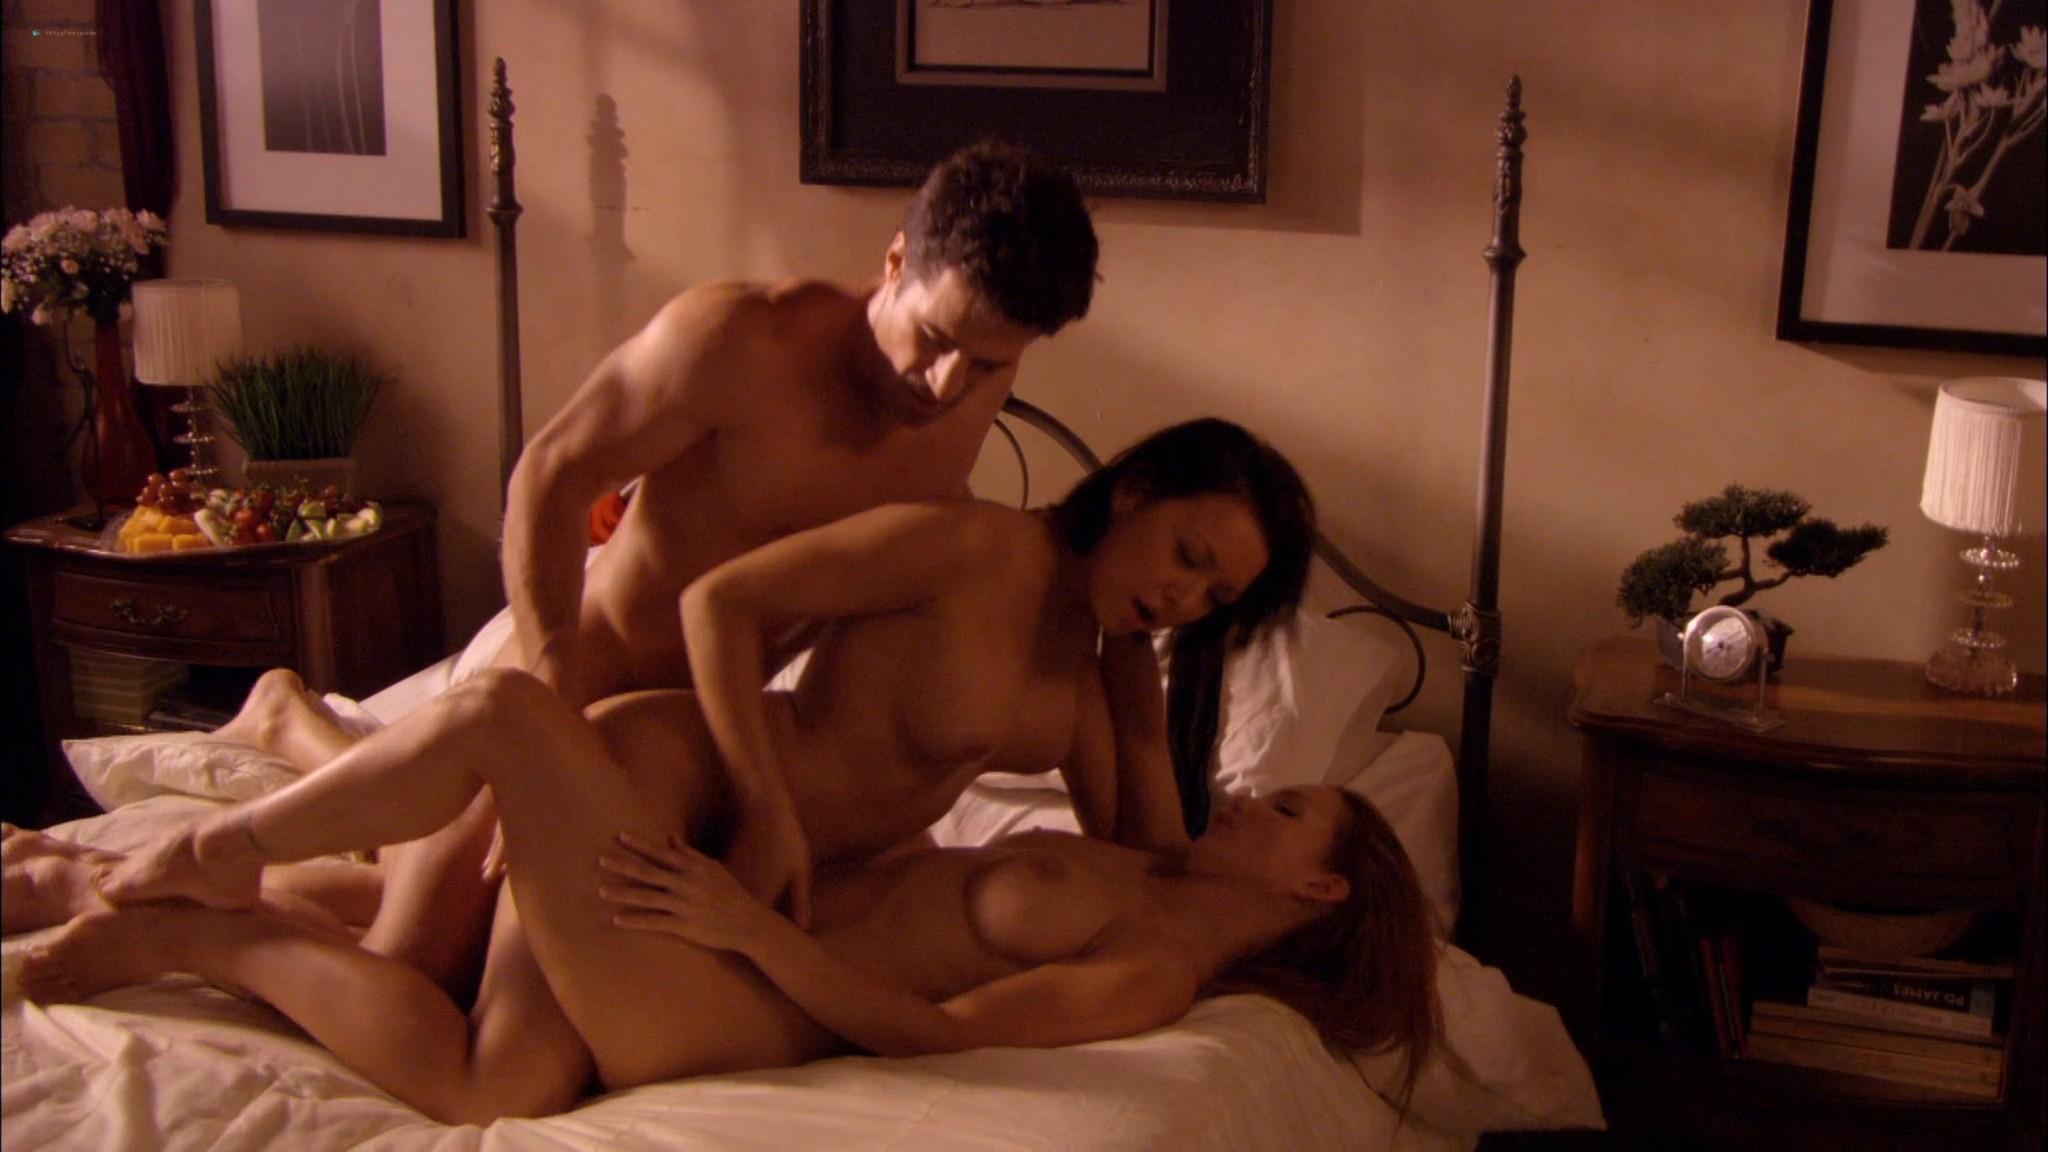 Lana Tailor nude sex Denise Cobar Jennifer Korbin all nude and hot sex Lingerie 2010 s2e7 HD 1080p Web 5